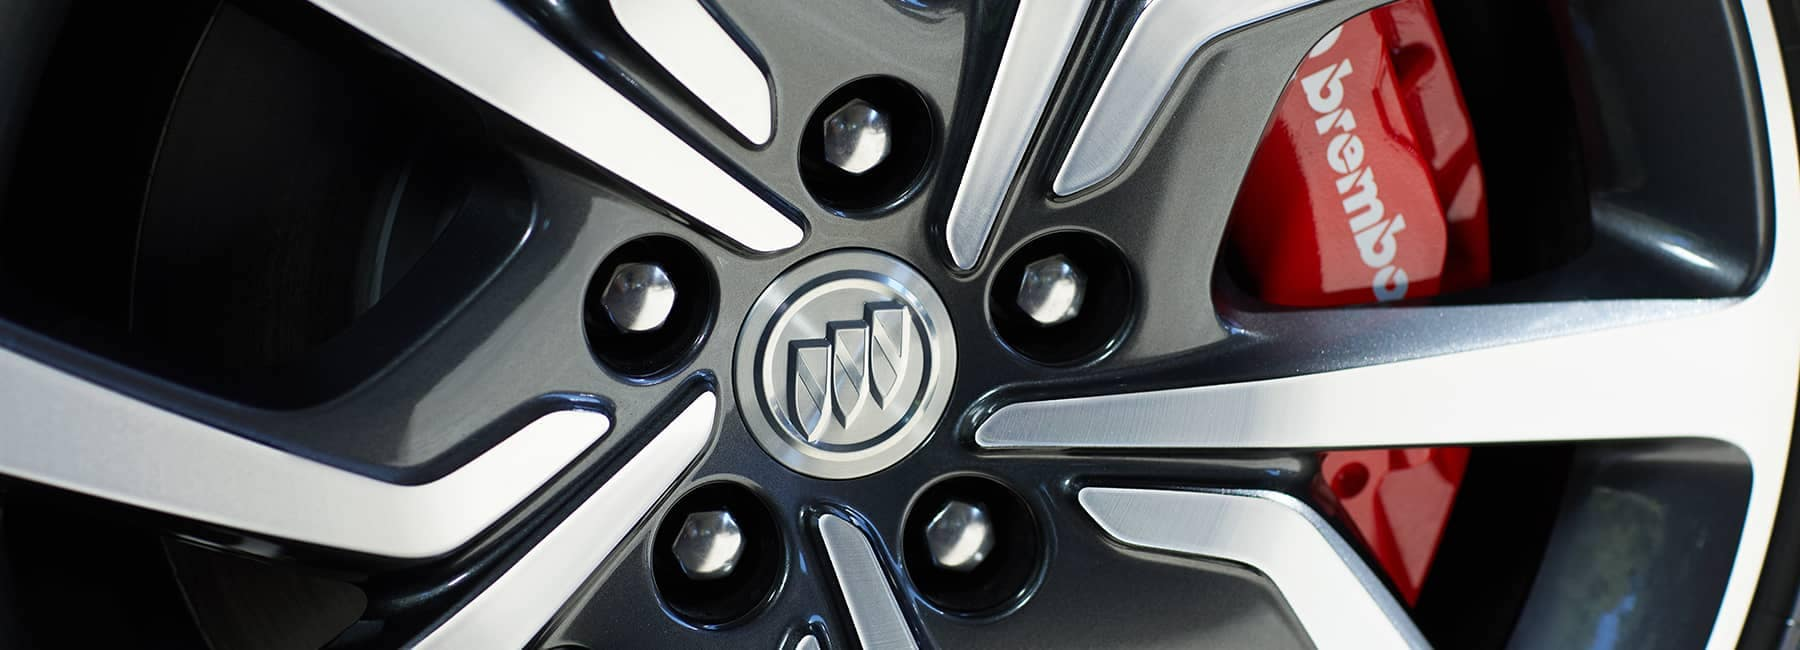 2020 Buick Regal Sportback Tire Rim Closeup